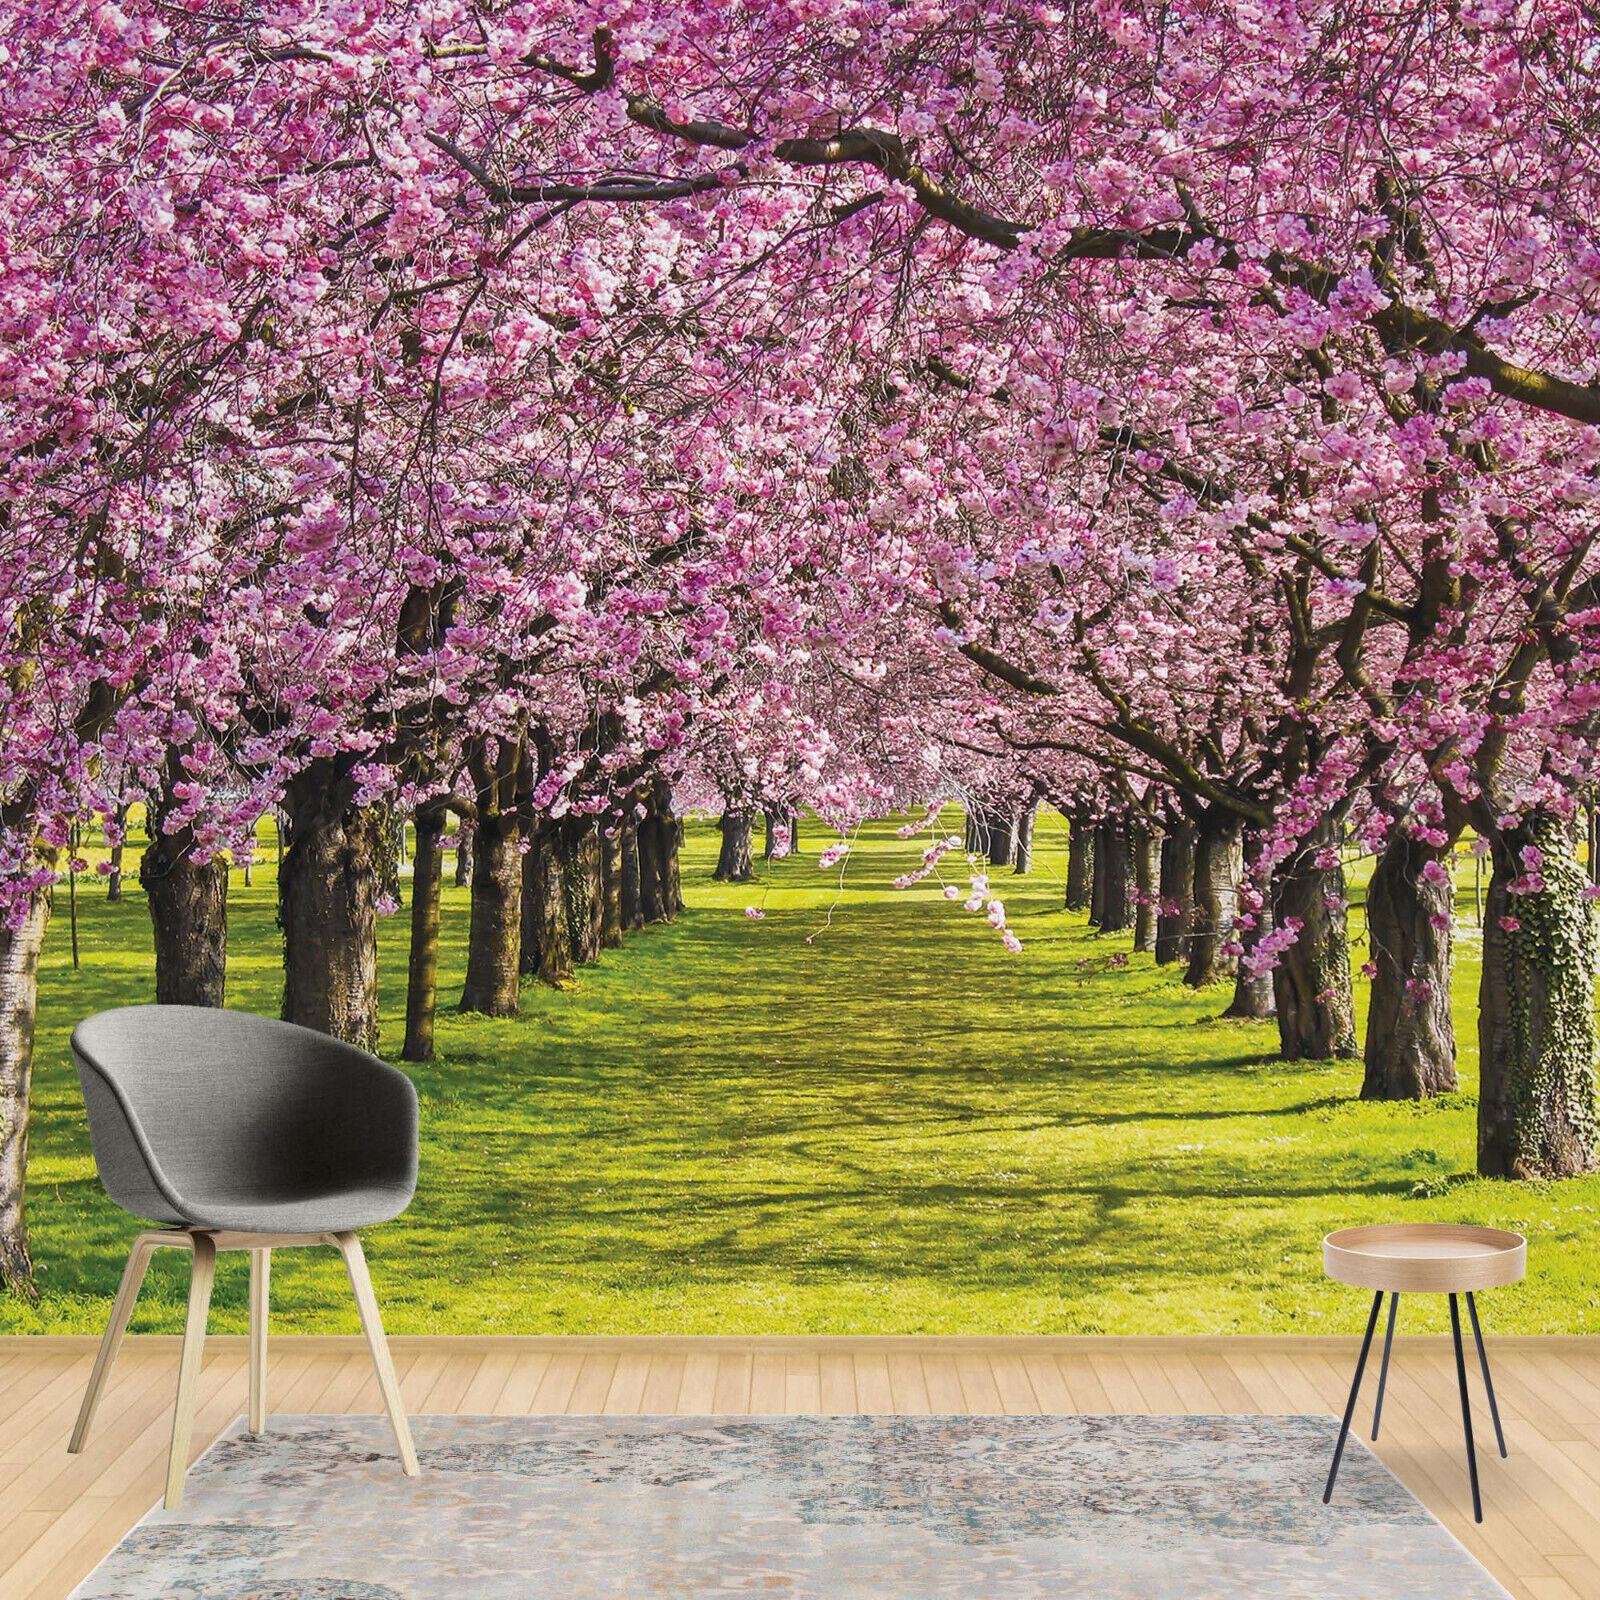 Tapete Vlies Fototapete Landschaft Pflanzen blühende Bäume Baumallee Frühling